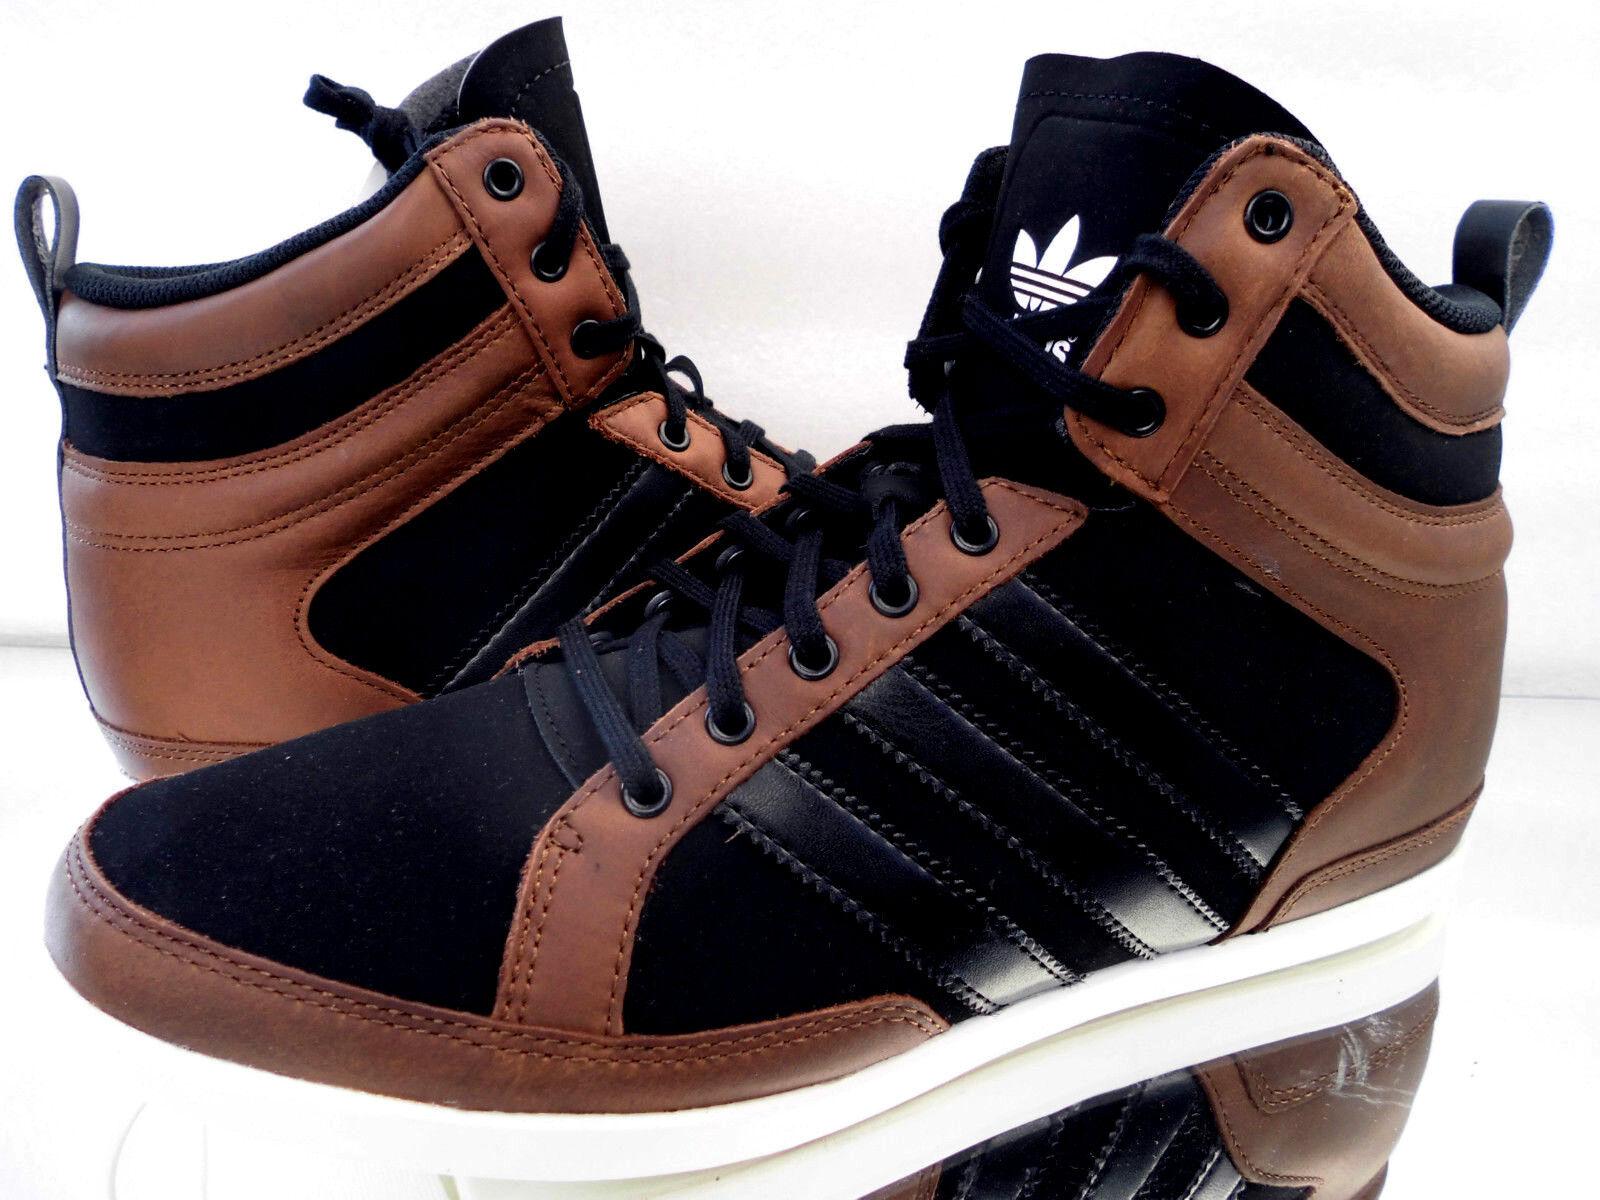 ADIDAS Originals ADI UP MID M20425 Turnschuhe Sneaker Leder/Textil M20425 Neu